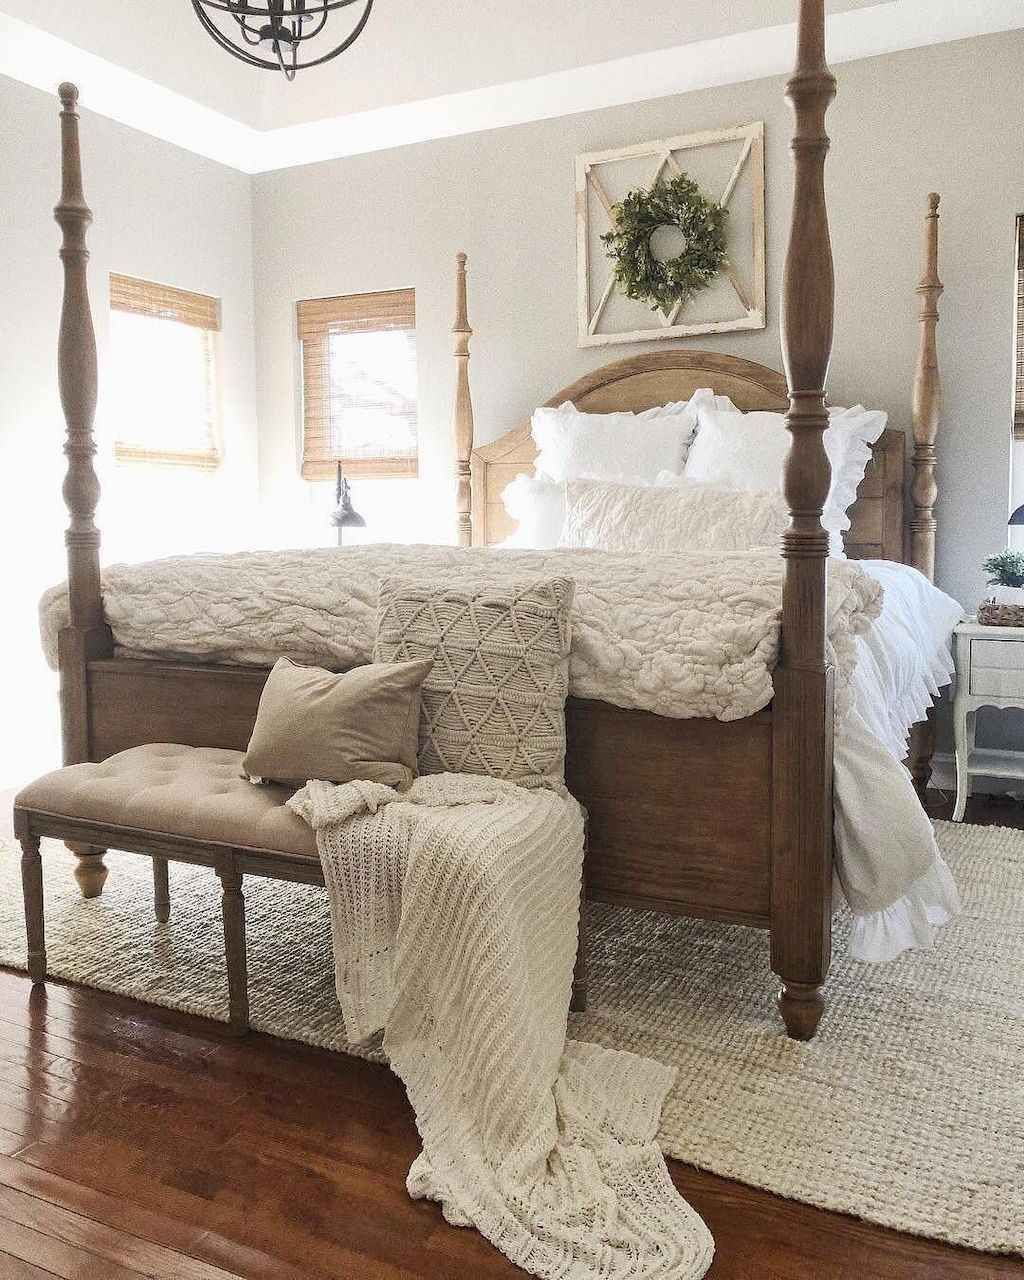 75 urban farmhouse master bedroom decor ideas in 2020 on modern farmhouse master bedroom ideas id=16588